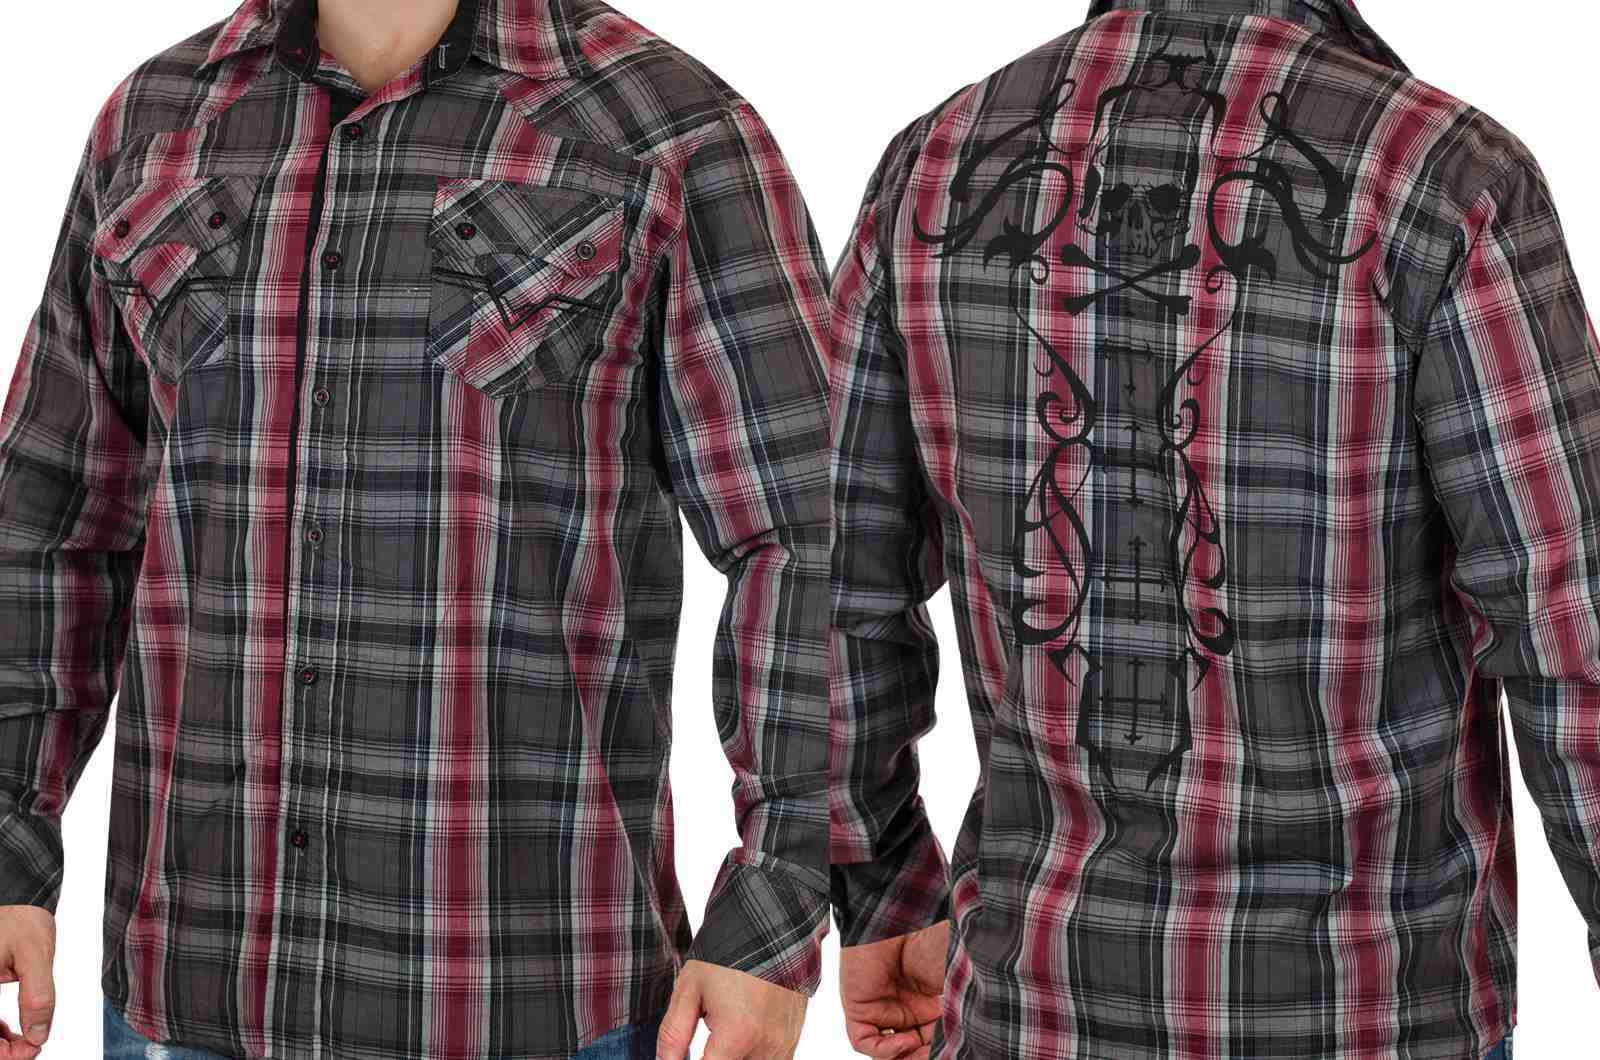 Трендовая мужская рубашка от Modern Culture (США)